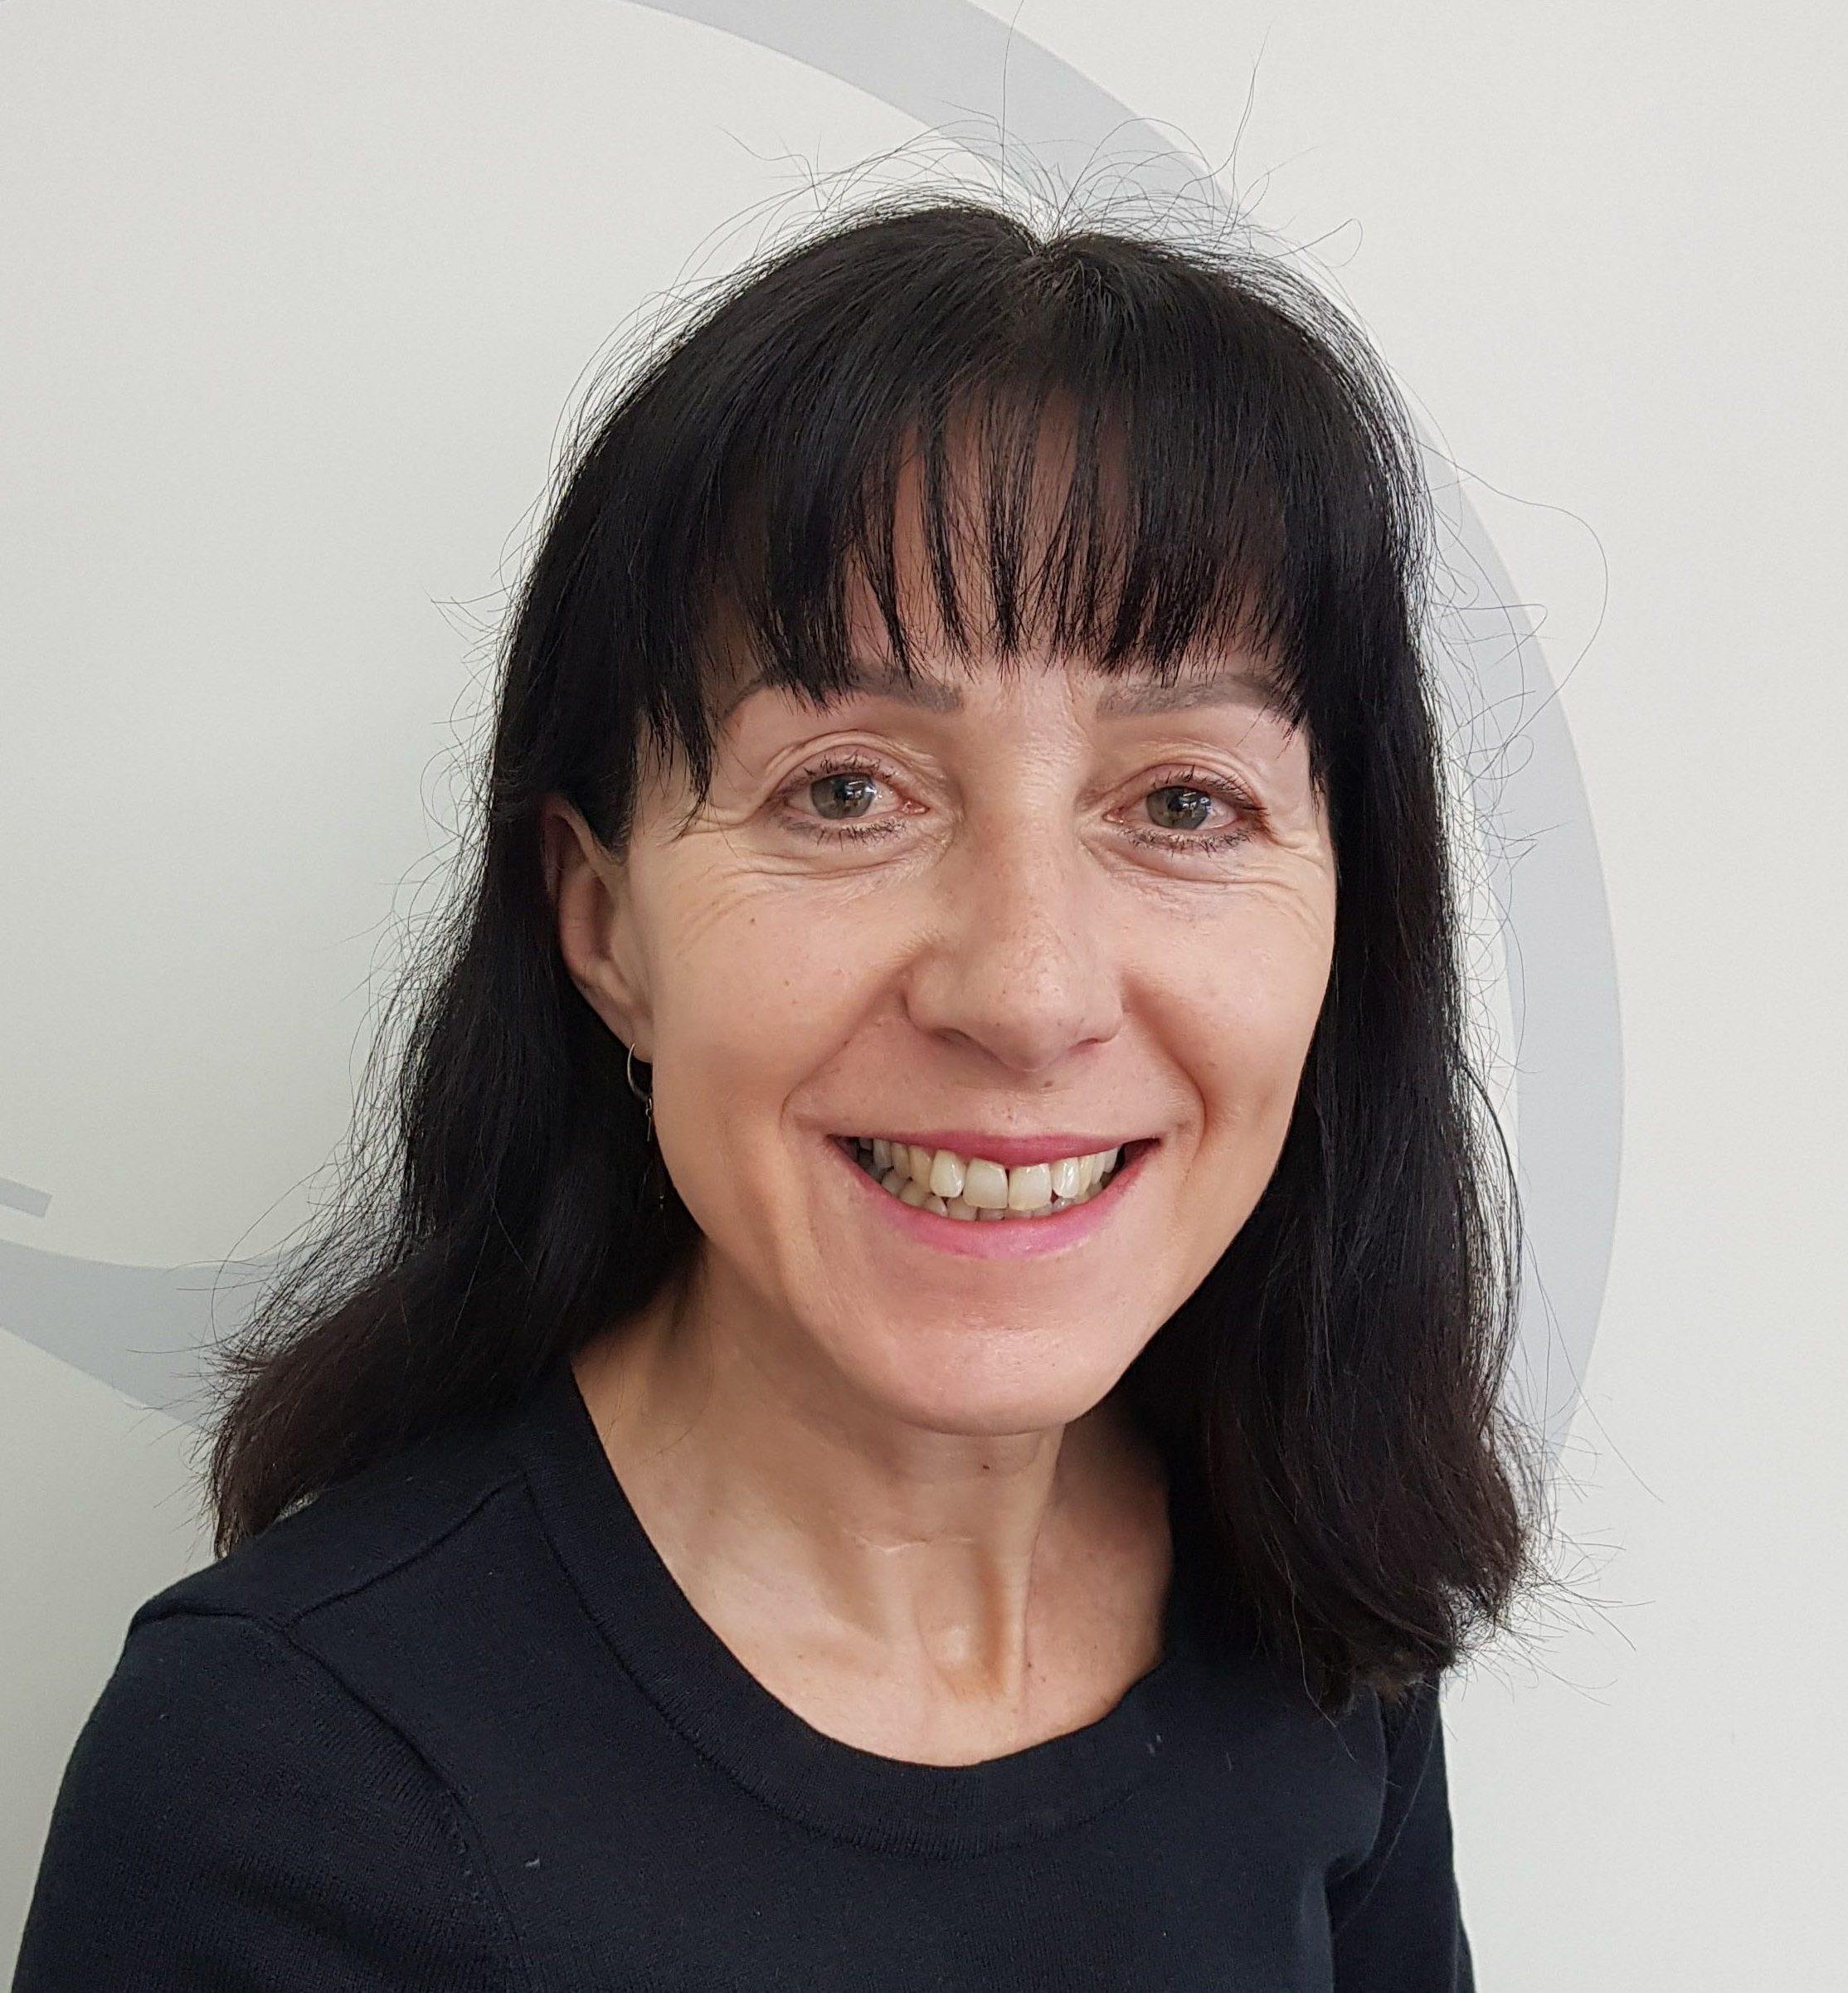 Sabine Knebel